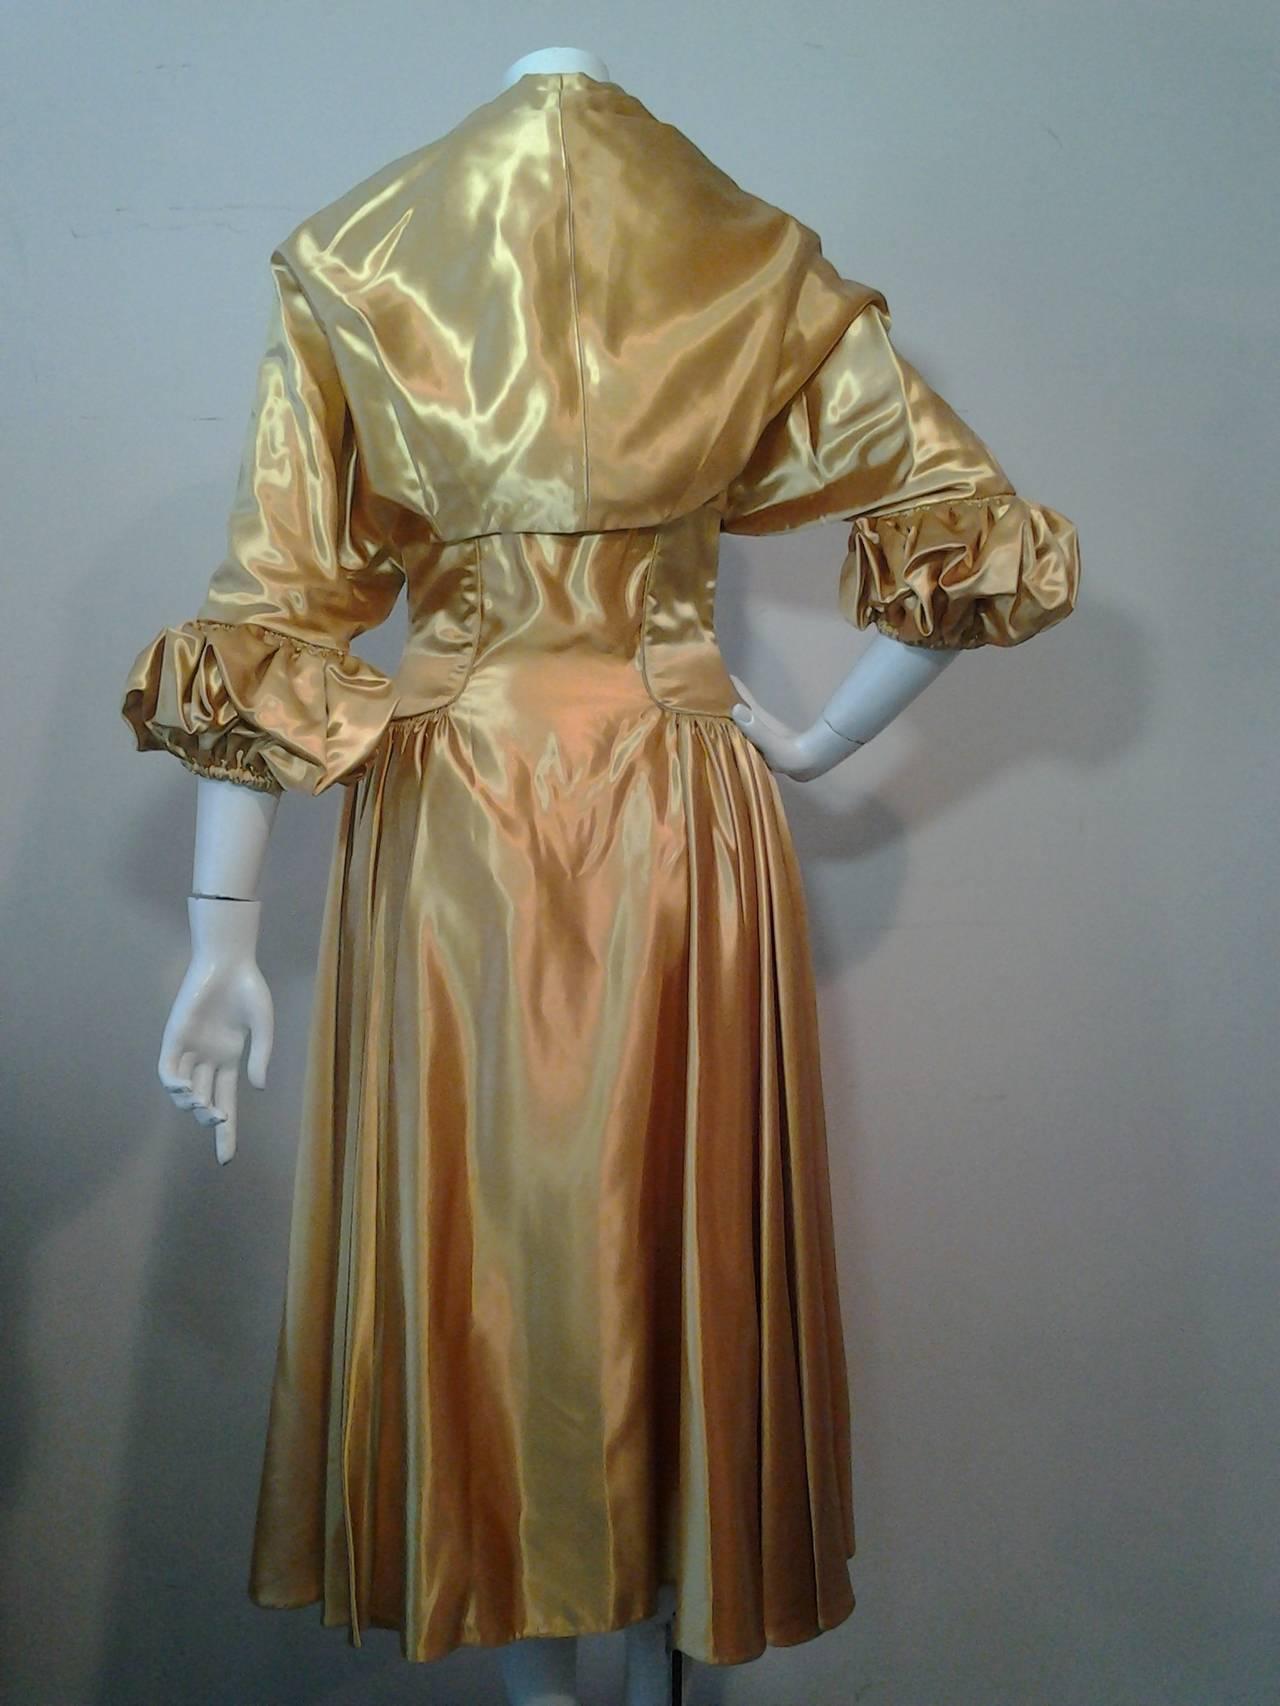 1950s Gold Silk Satin Strapless Dress and Jacket Ensemble 2